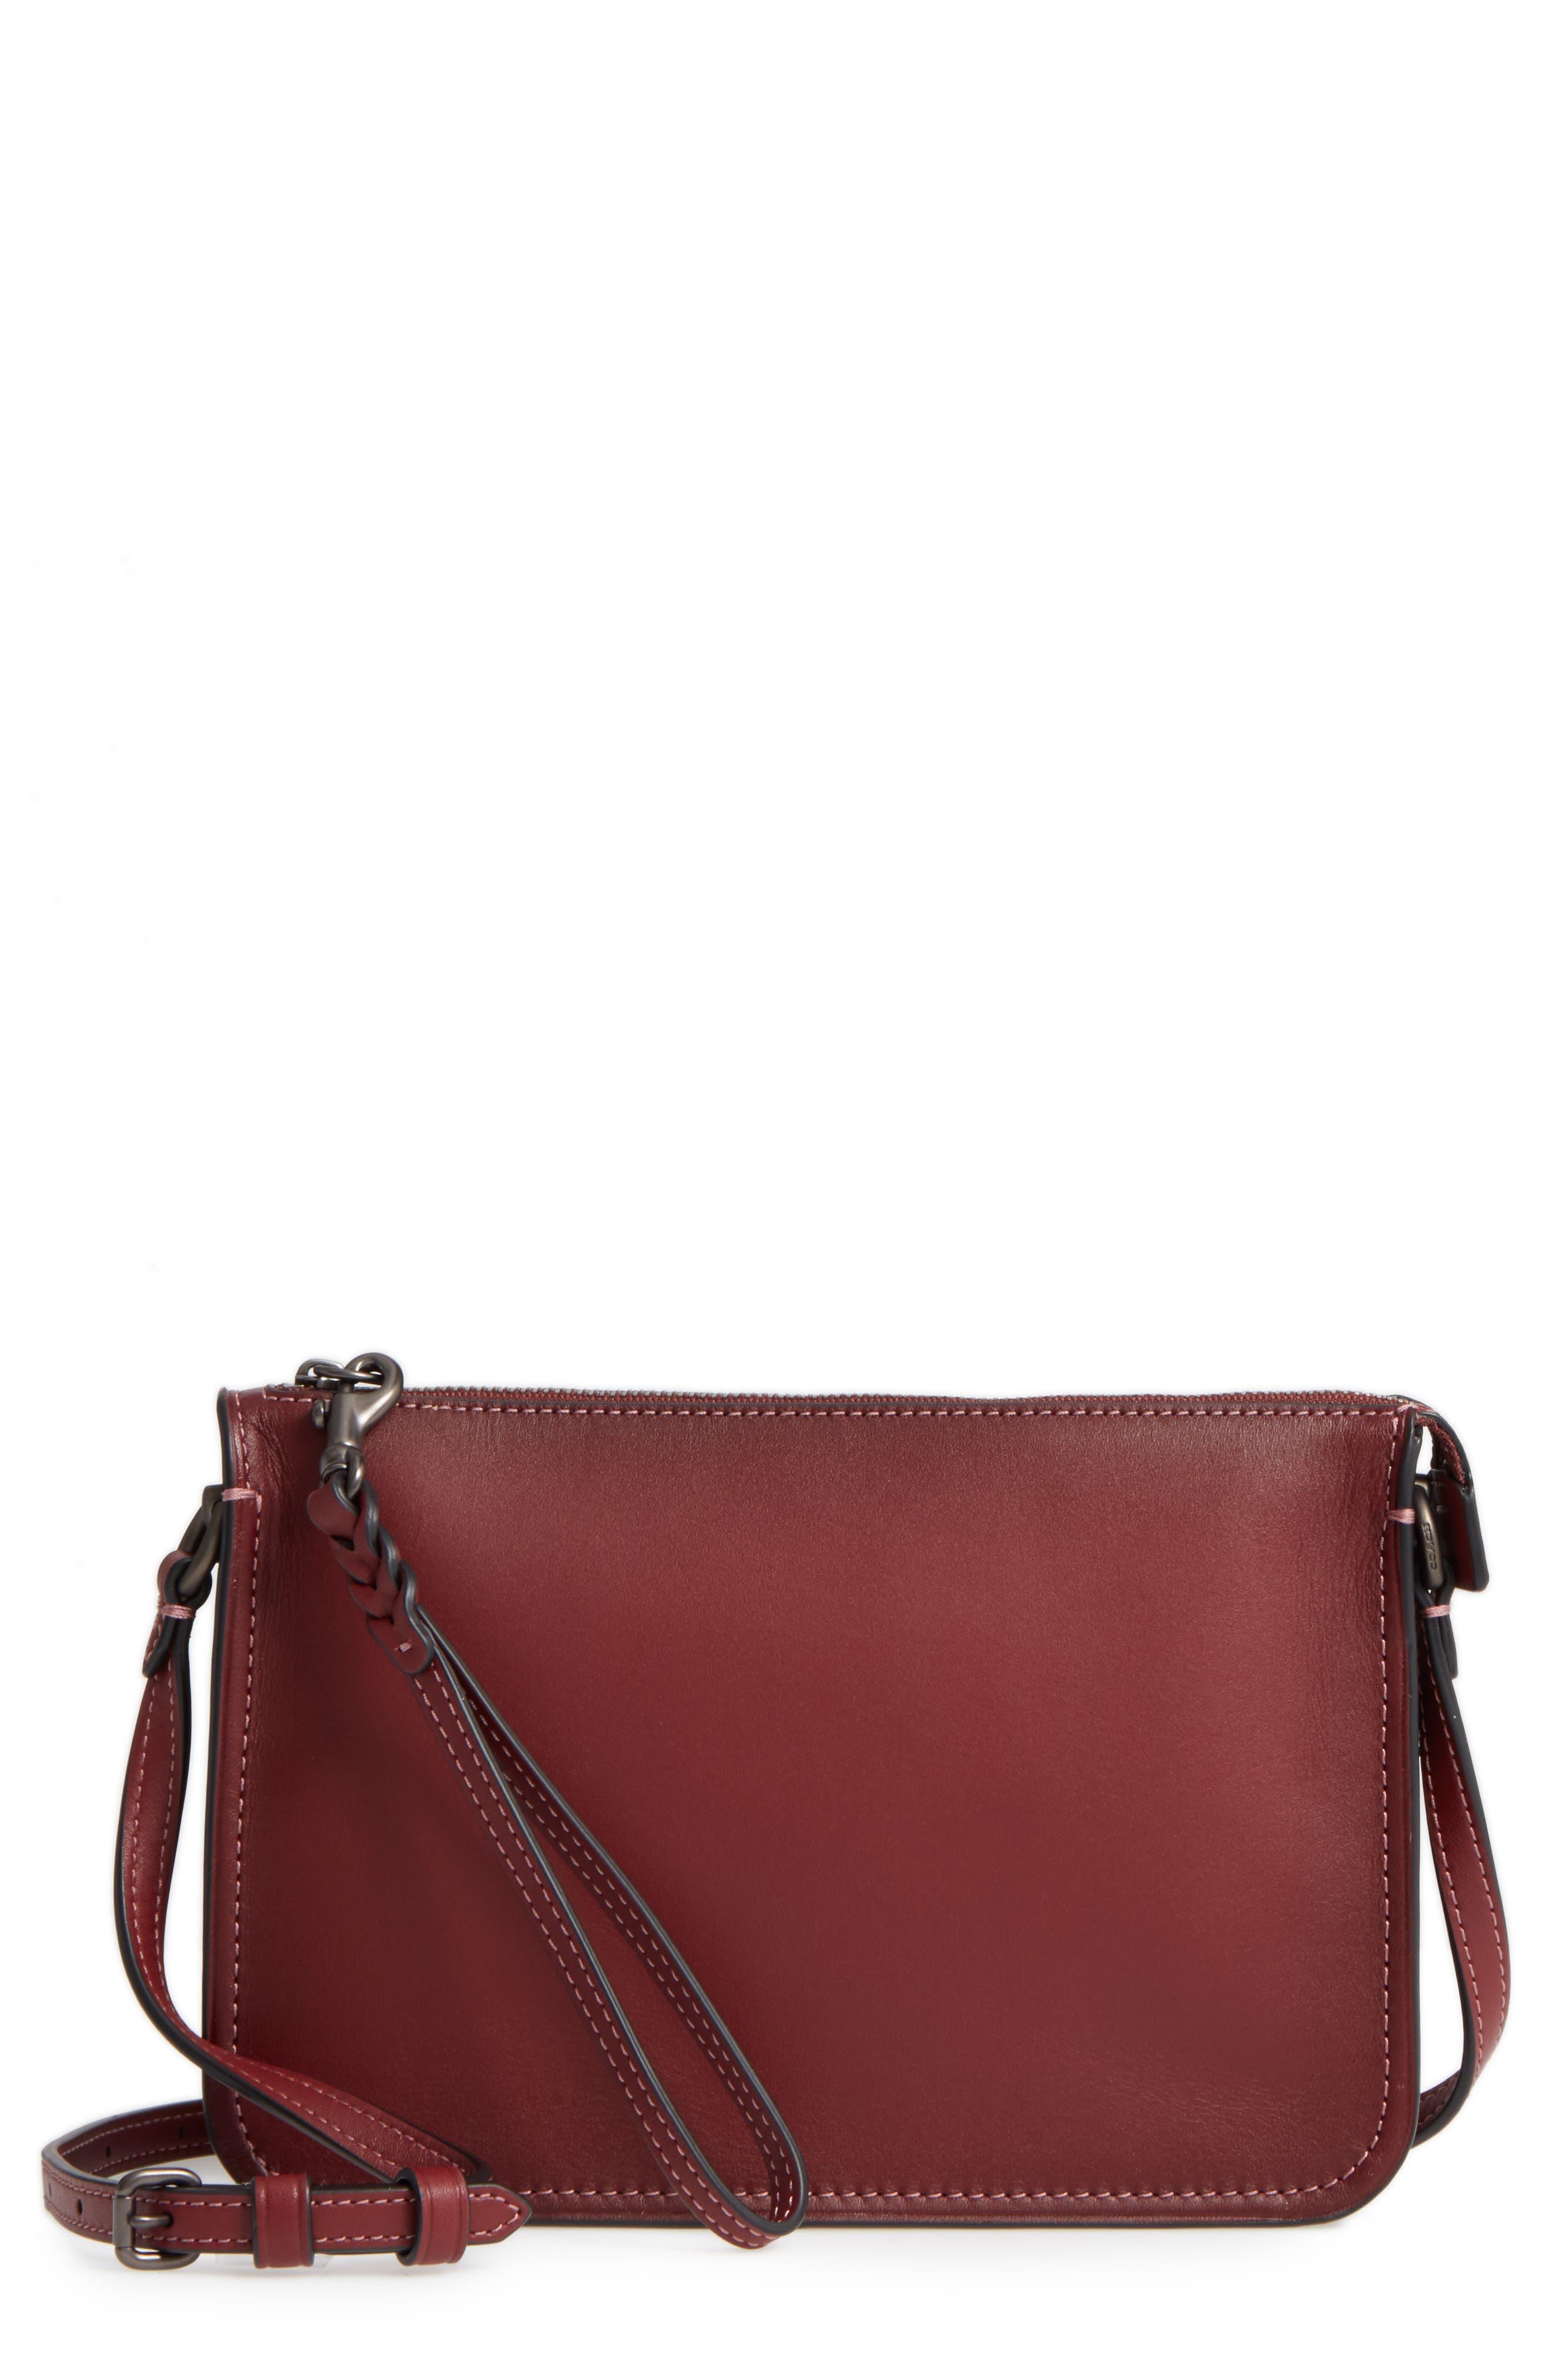 Soho Leather Crossbody Bag,                             Main thumbnail 1, color,                             614